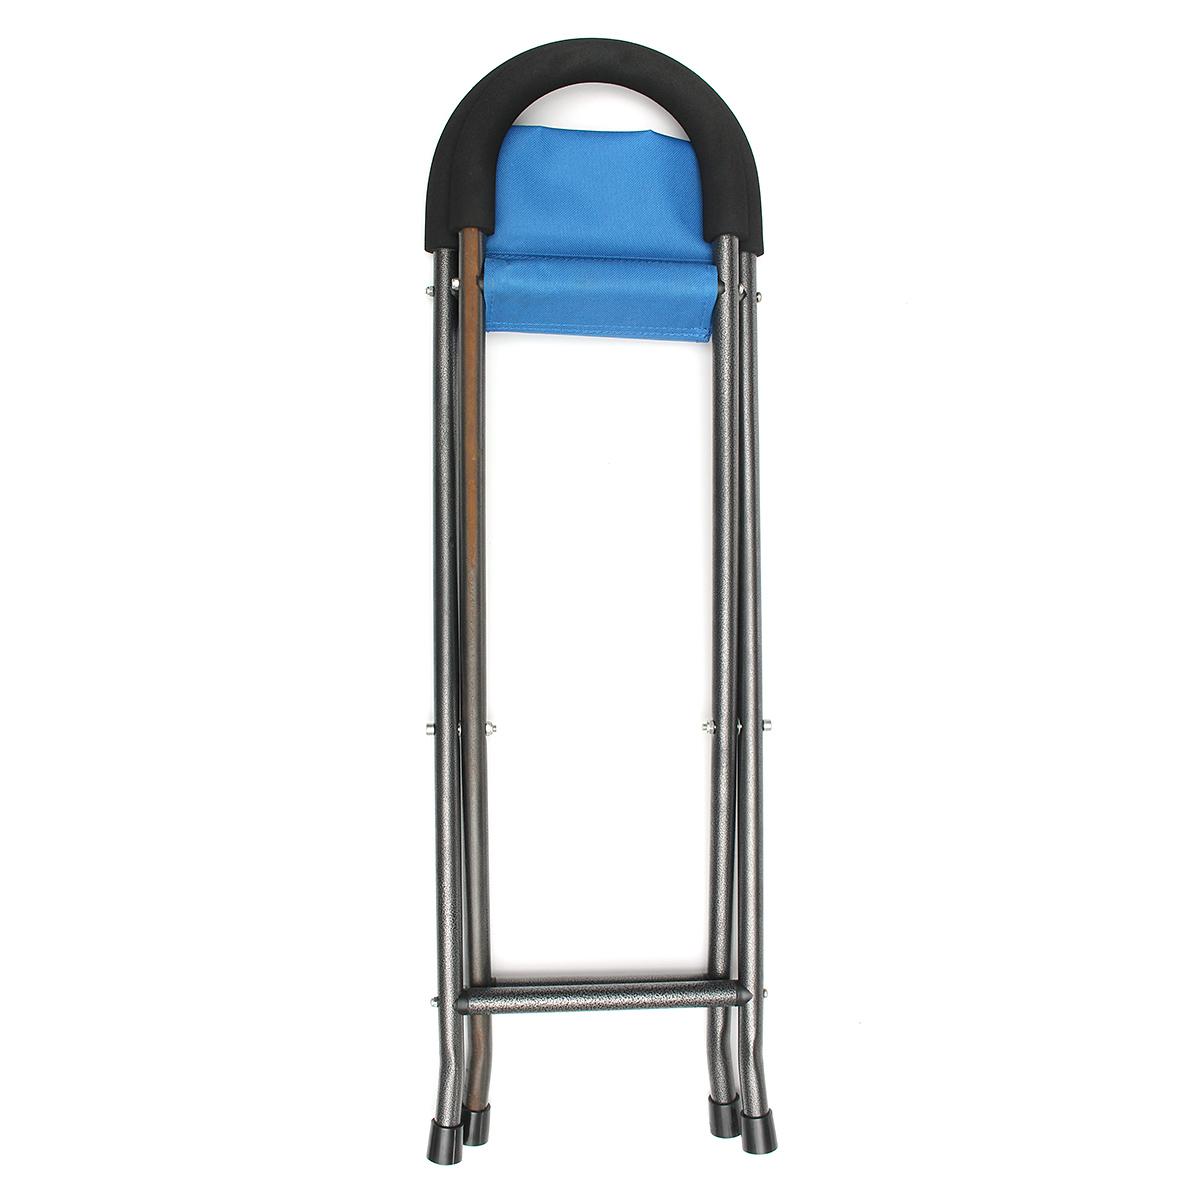 walking stick seat stool chair folding measurements ipree multi function pyramid